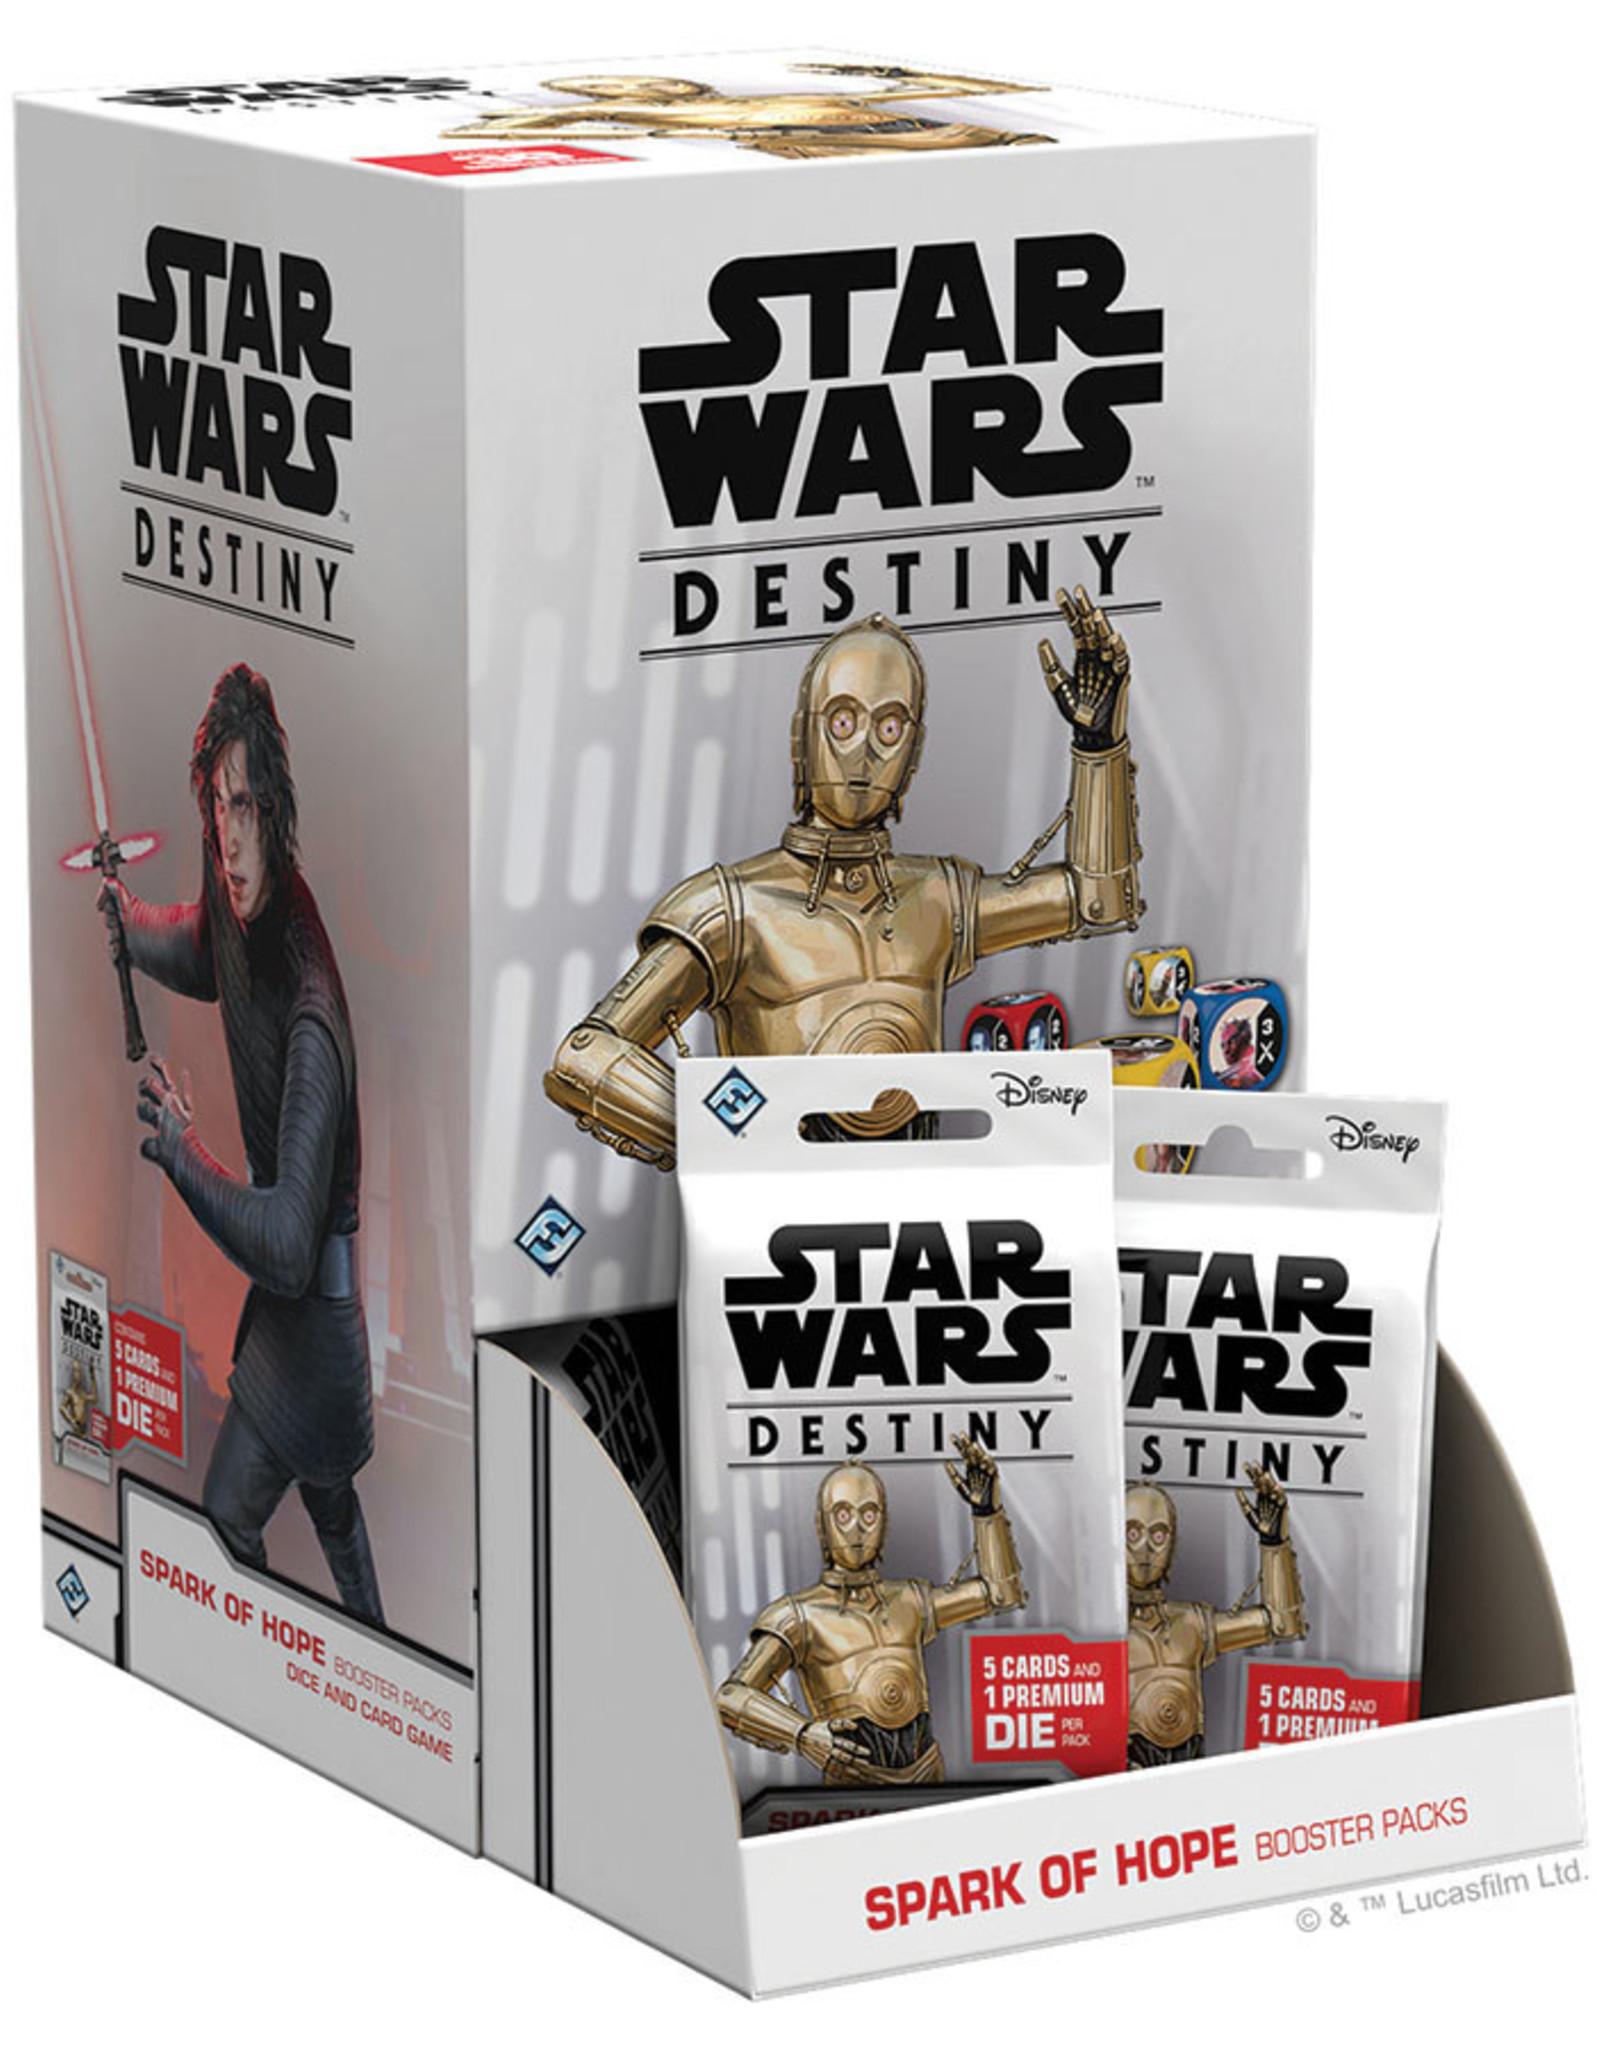 Fantasy Flight Games Star Wars Destiny: Spark of Hope booster display